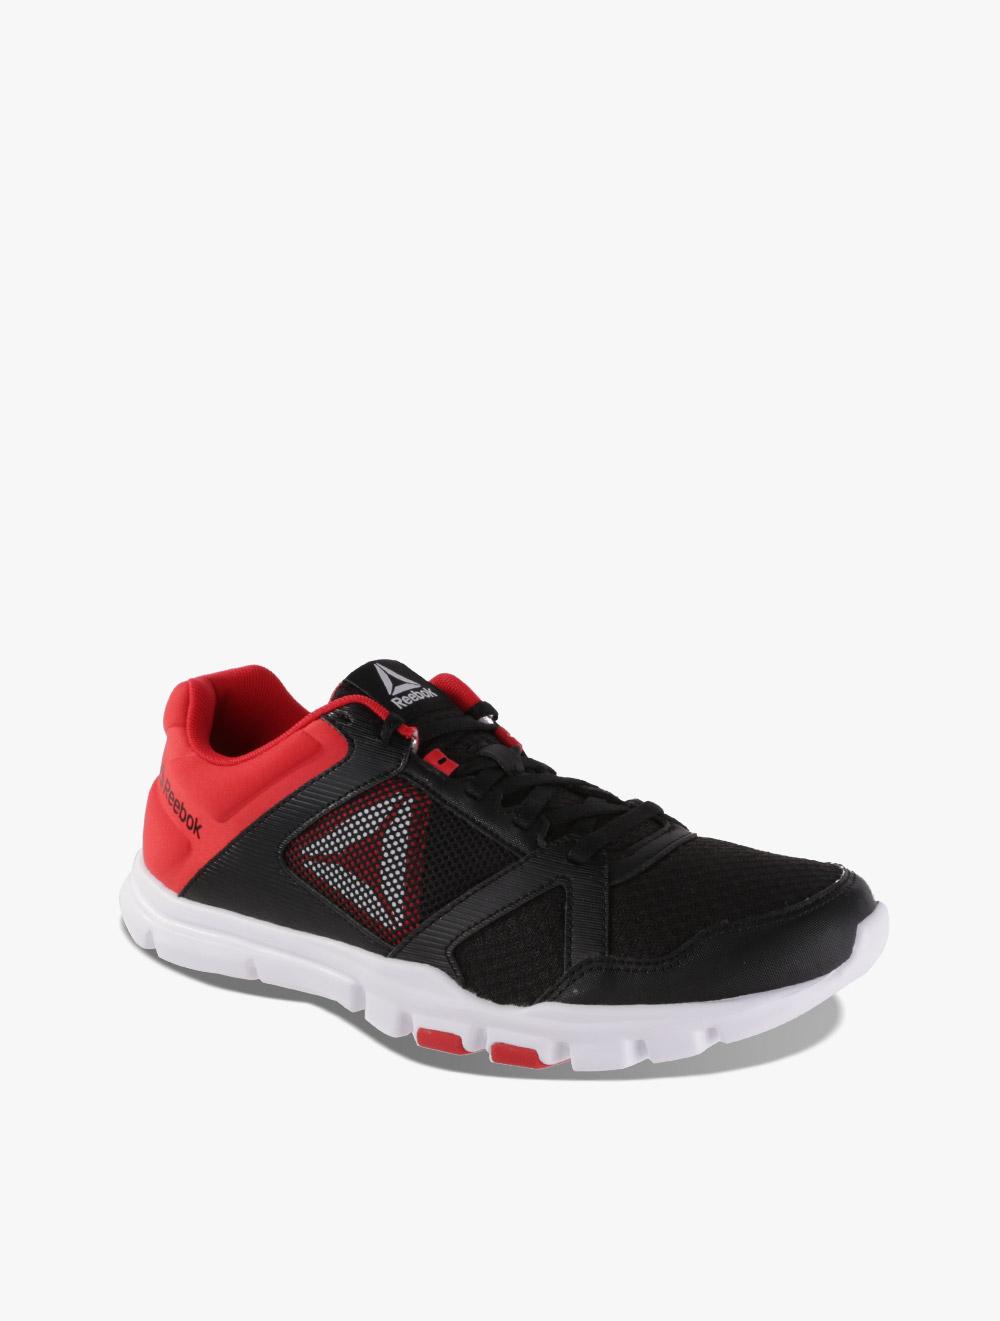 Reebok Yourflex Train 10 MT Men's Training Shoes